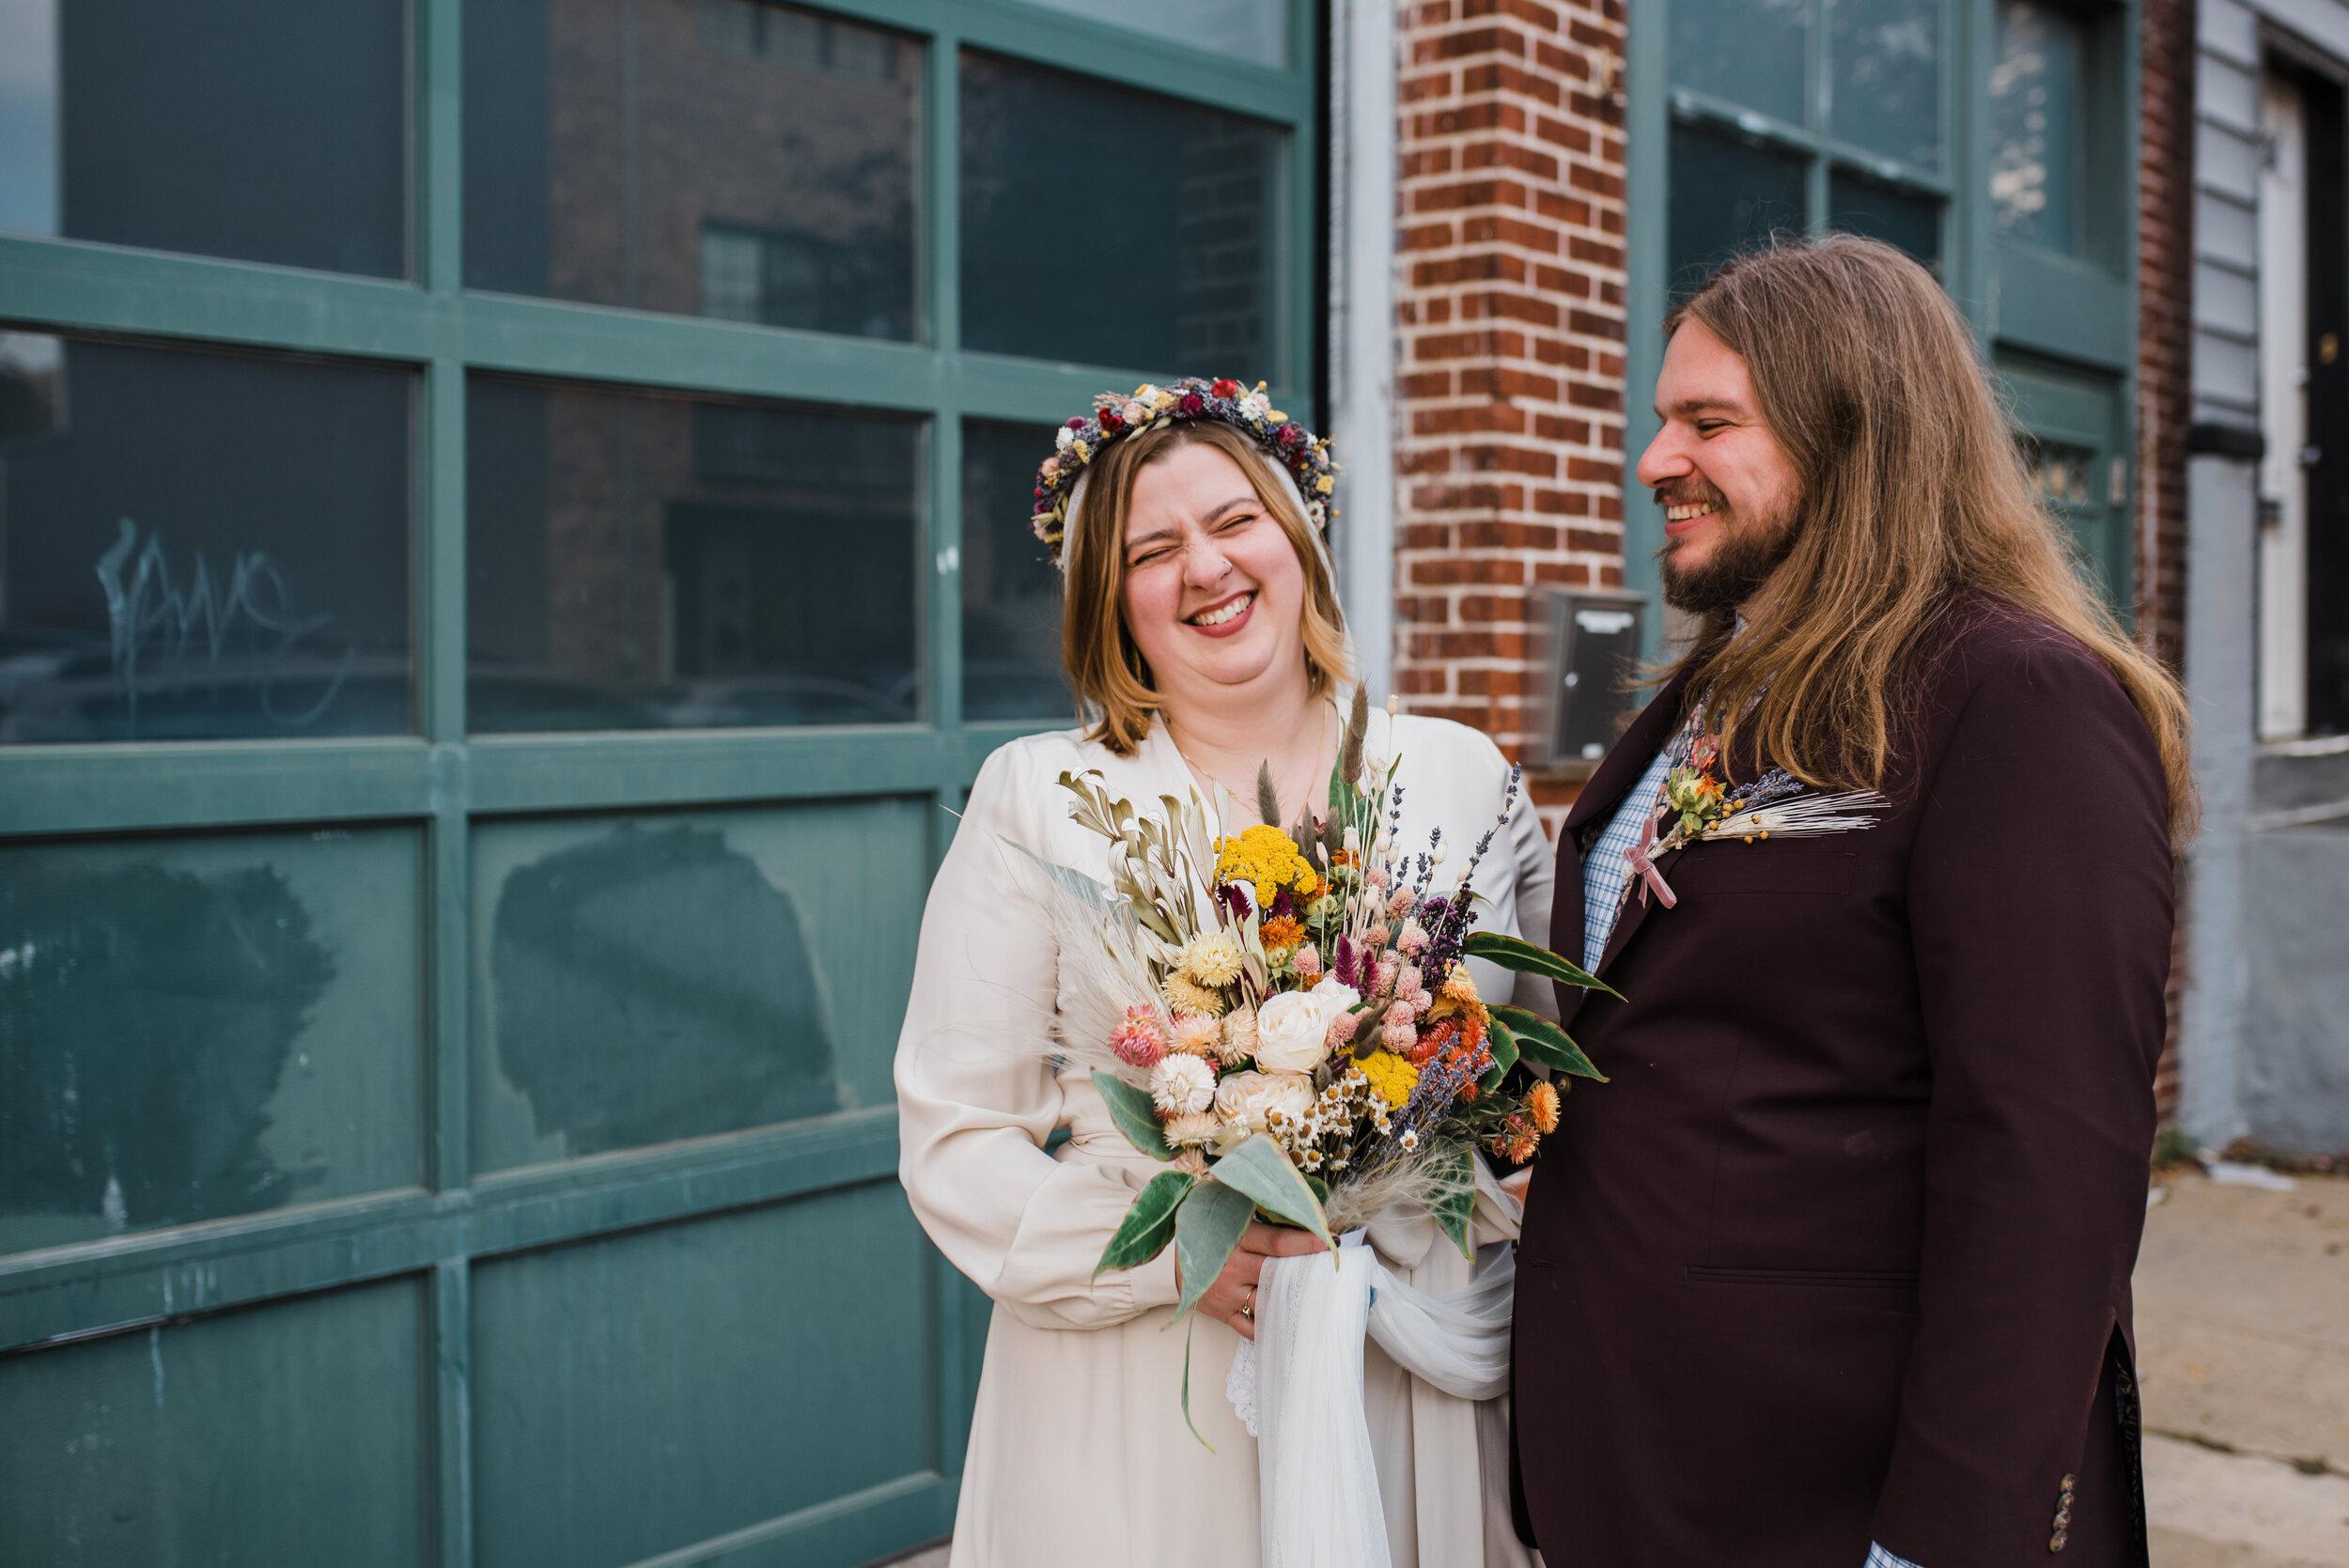 Hipster wedding couple in Philadelphia.